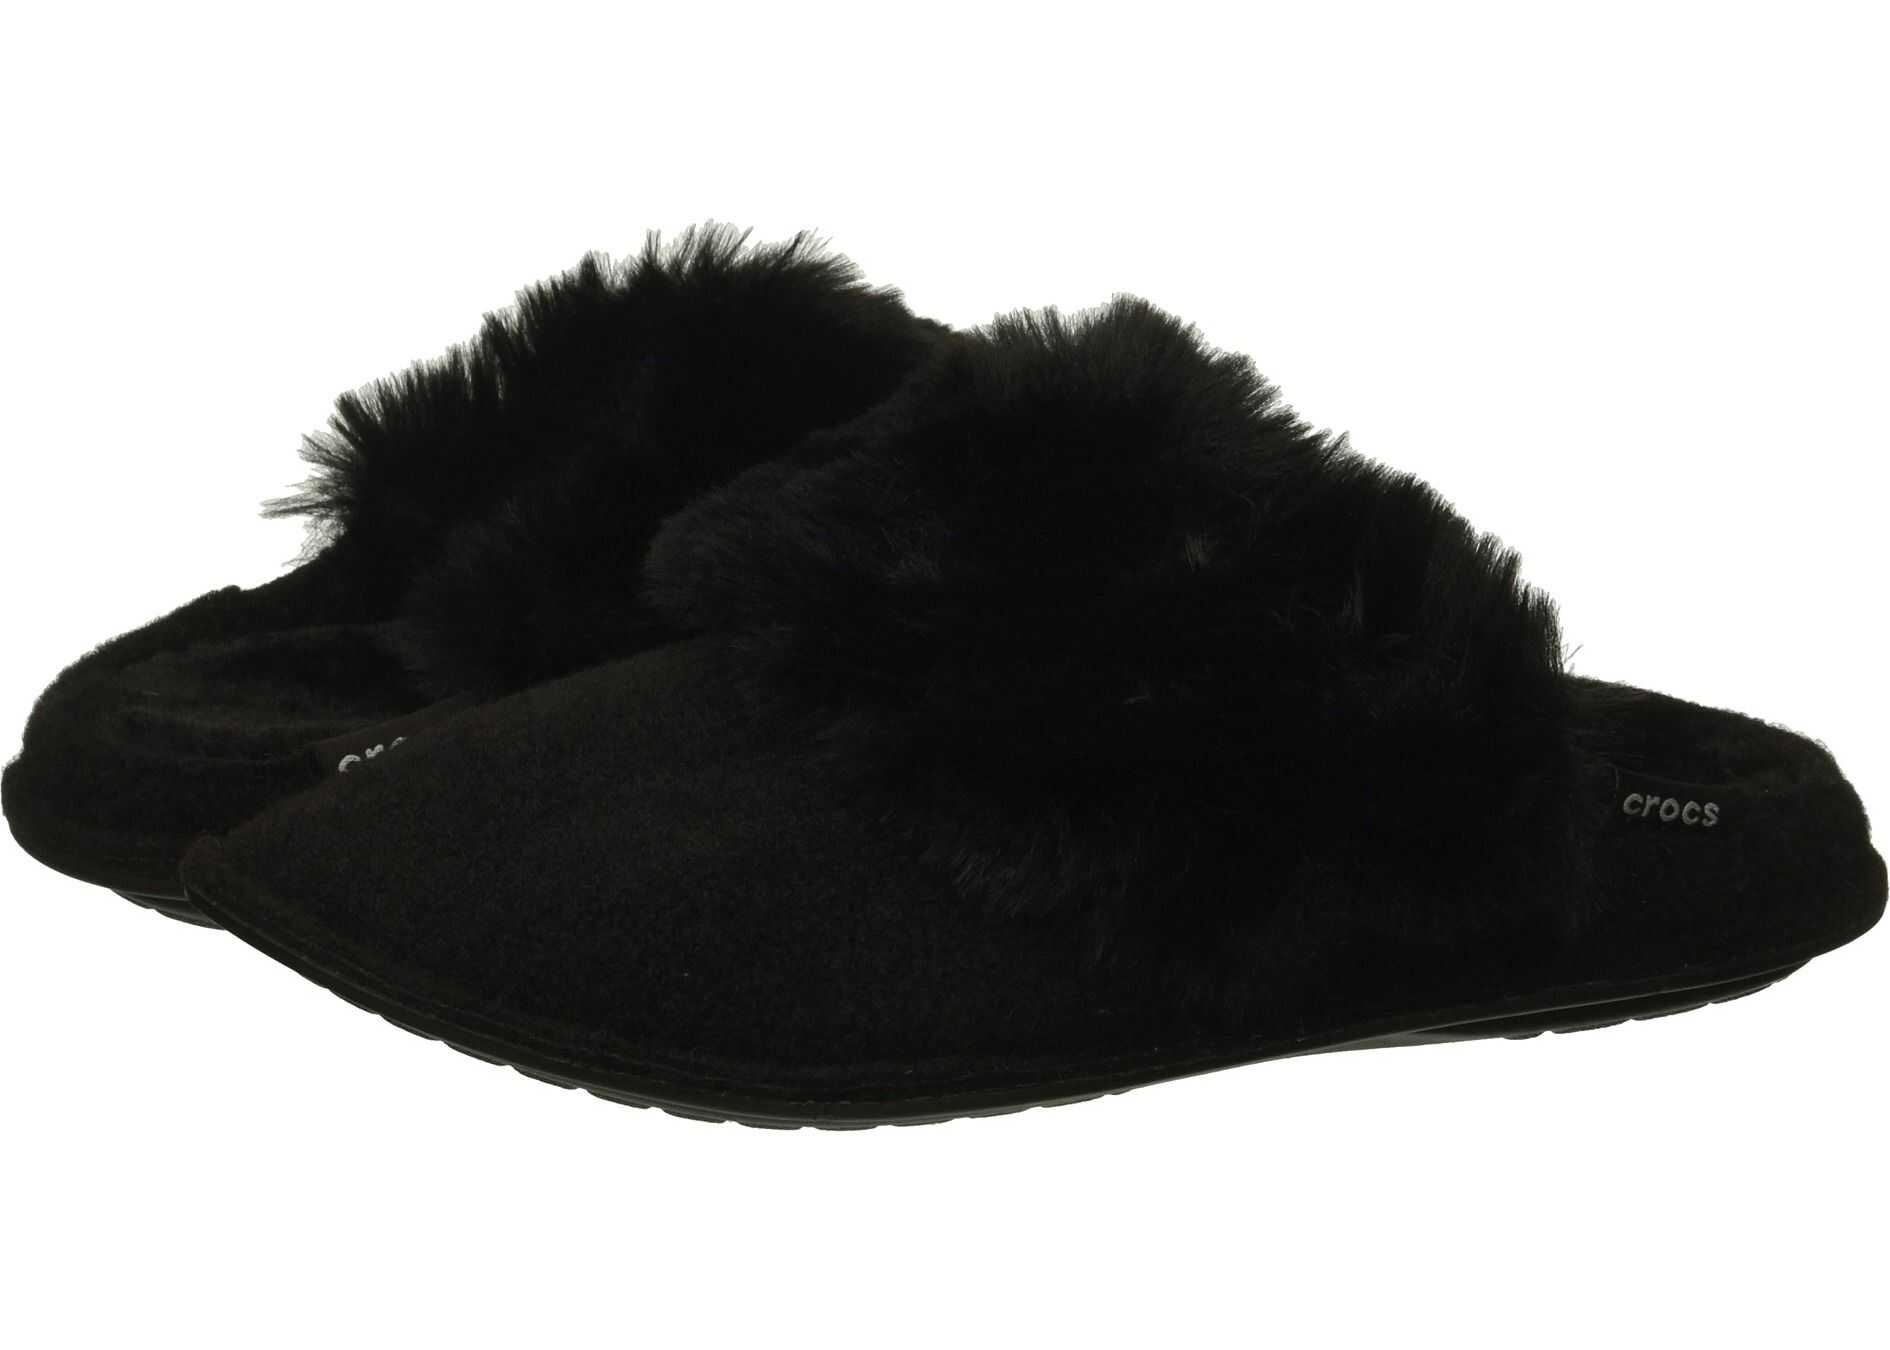 Crocs Classic Luxe Slipper Black